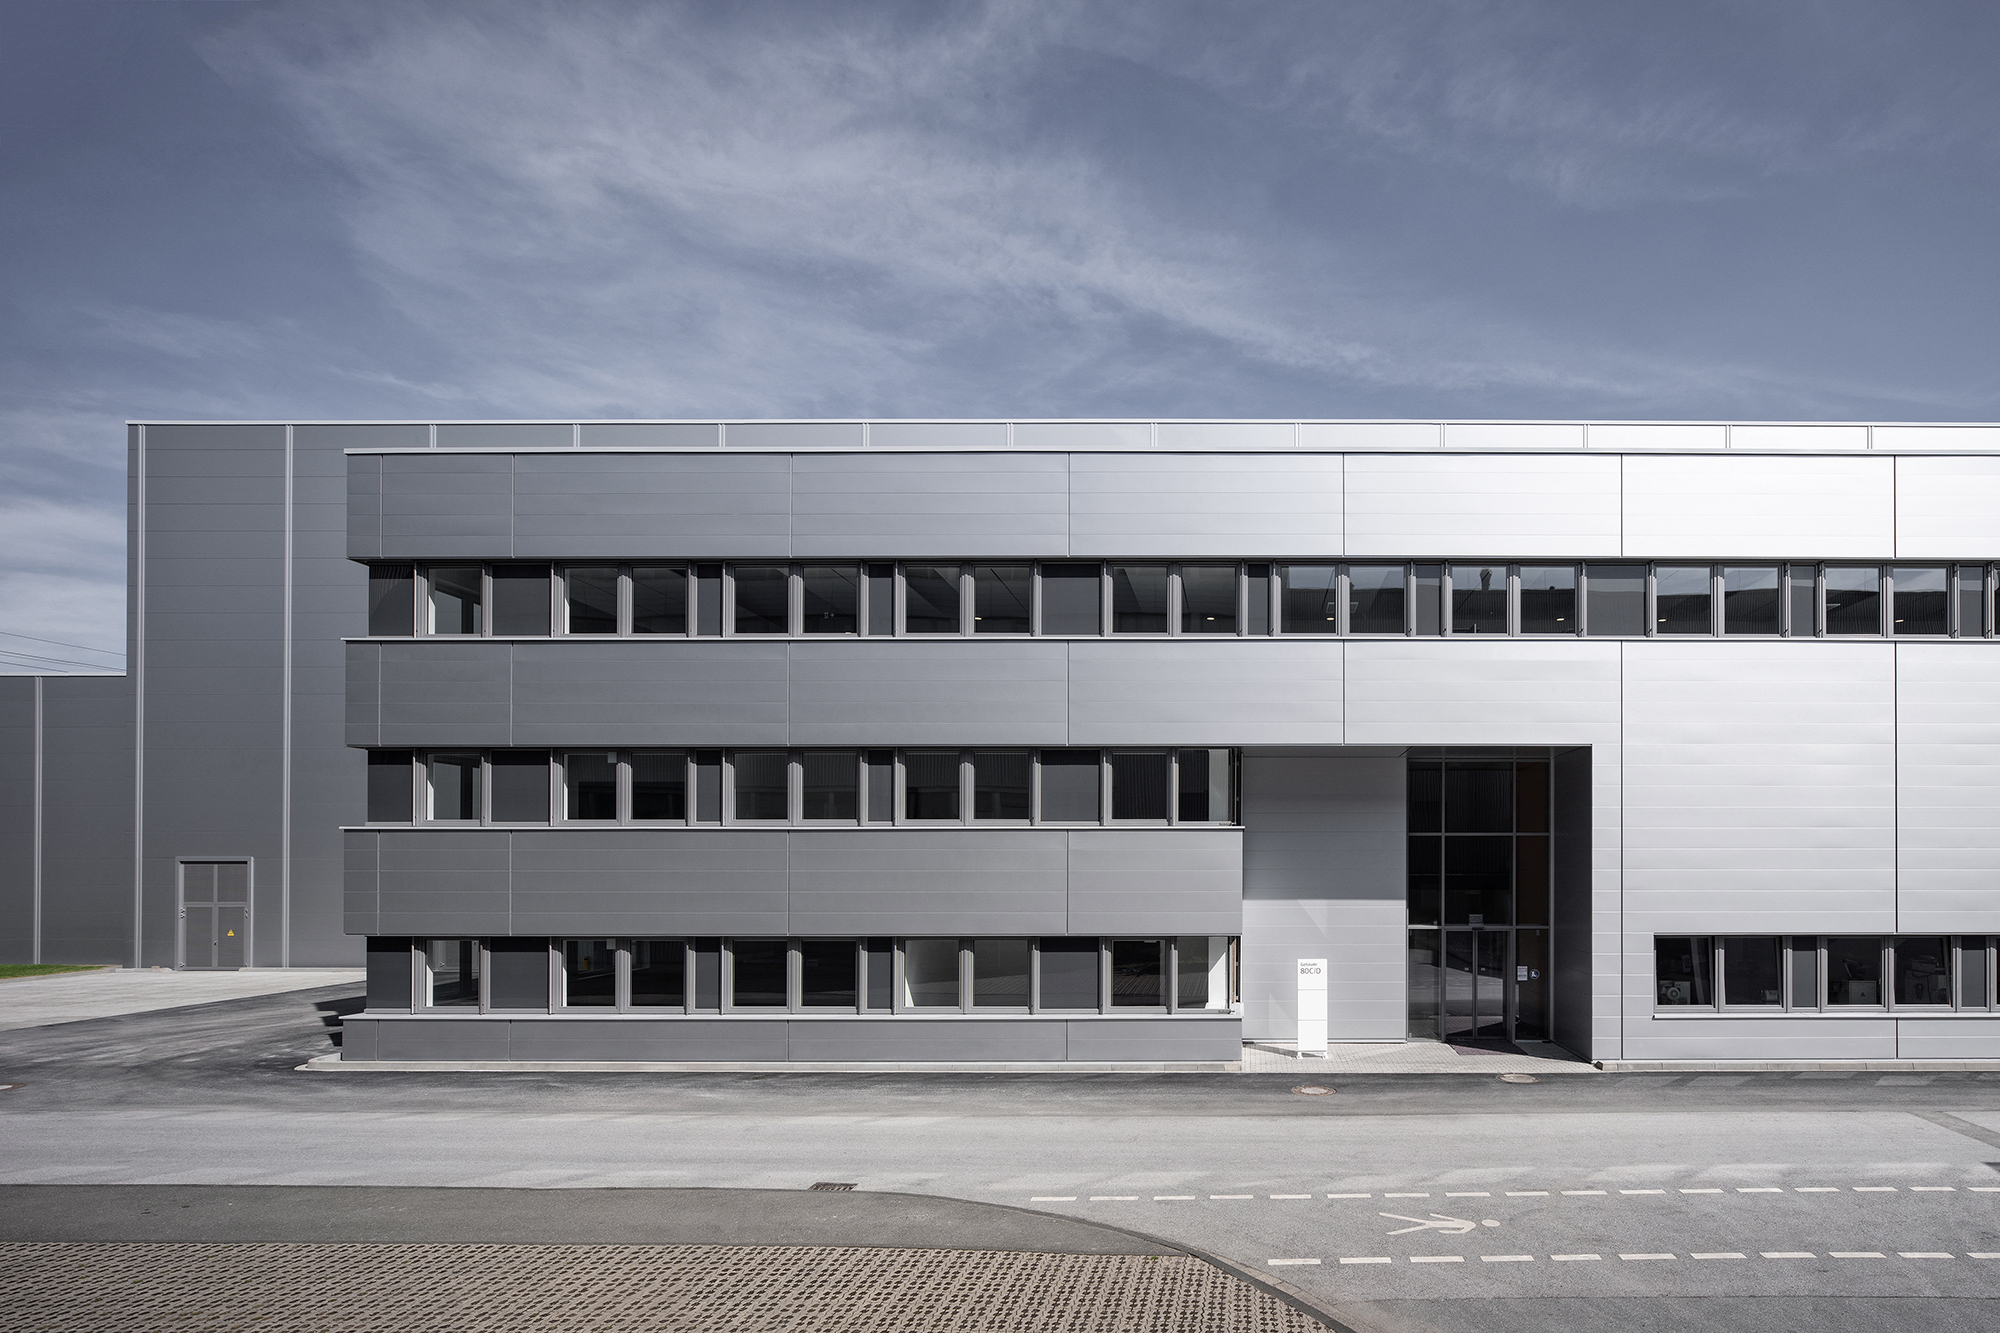 © aib GmbH/Manuel Kubitza, Köln